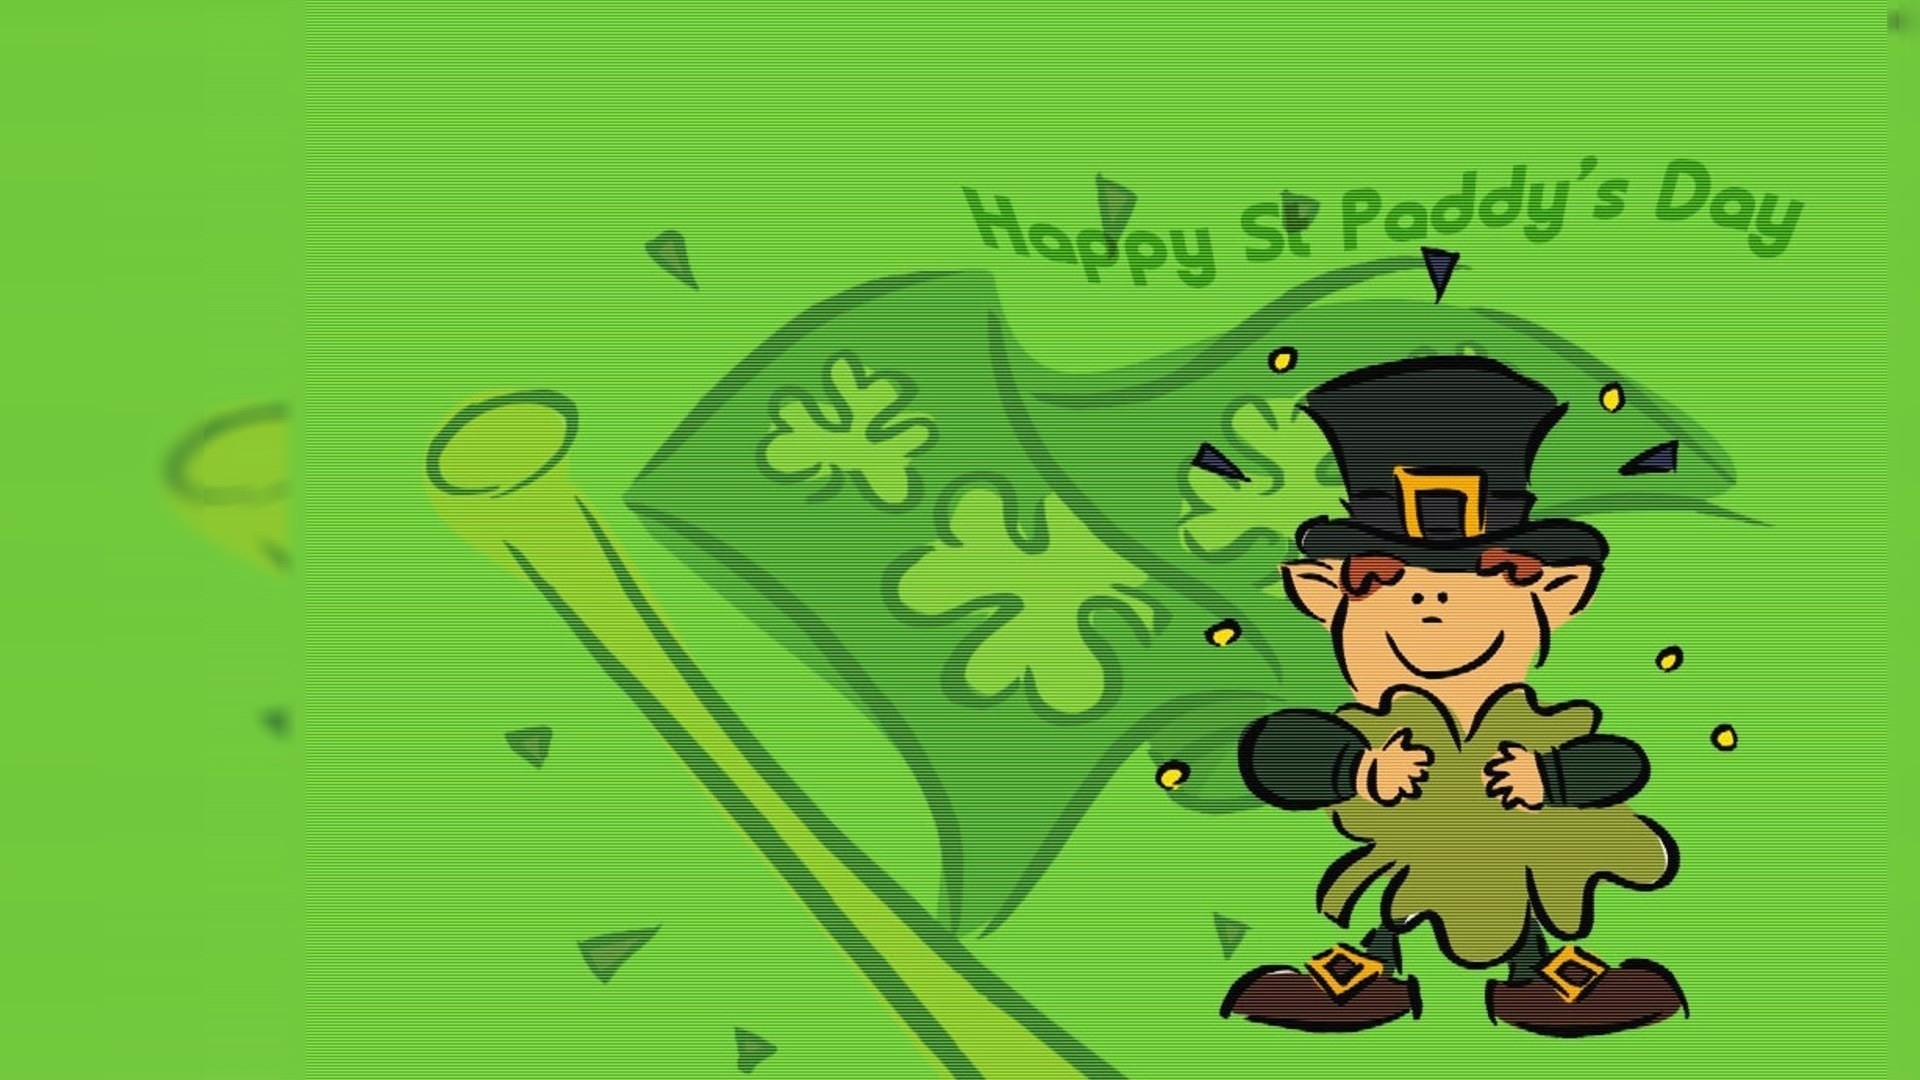 St. Patrick's Day 2021 Pic